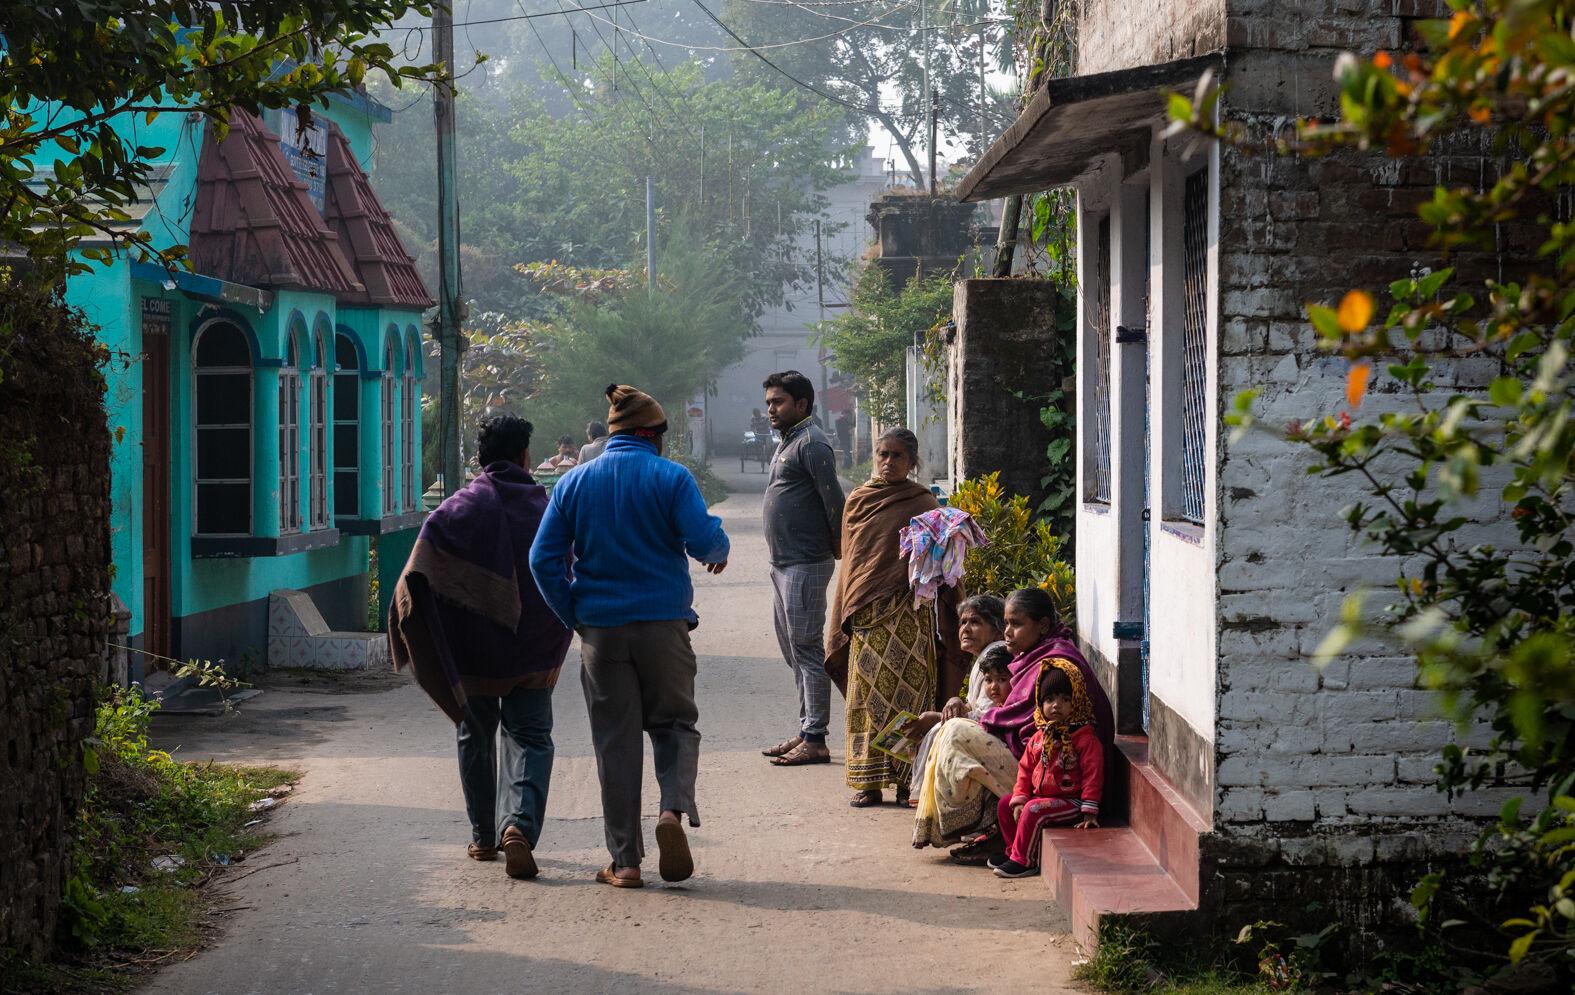 Village of Bawali, Bengal